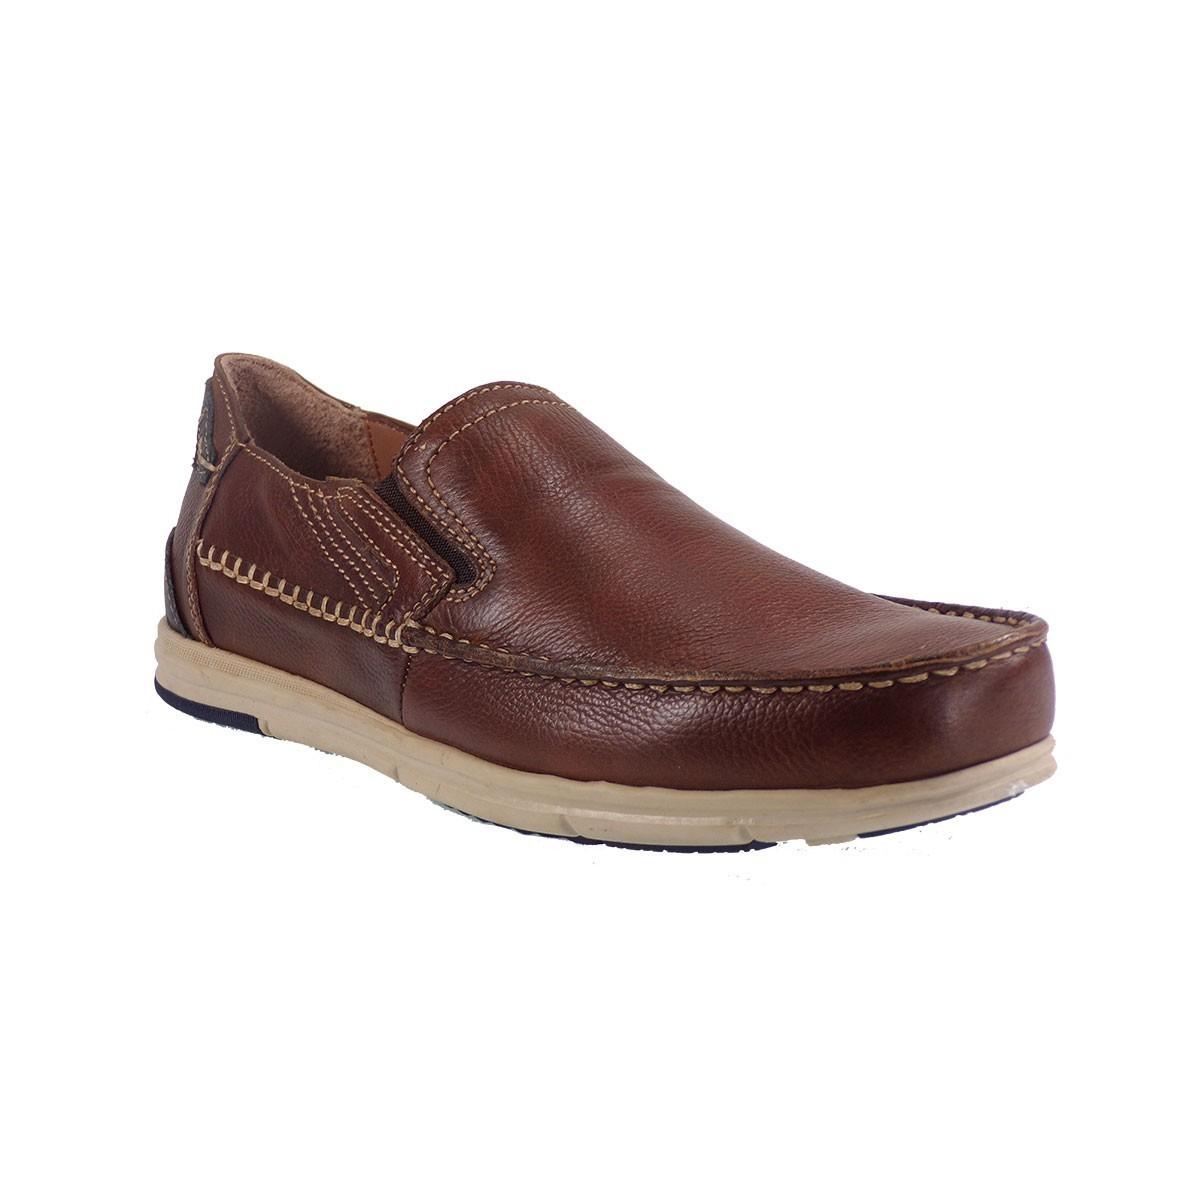 member shoes andrika papoytsia anatomika 9015 tampa www.bagiotashoes.gr